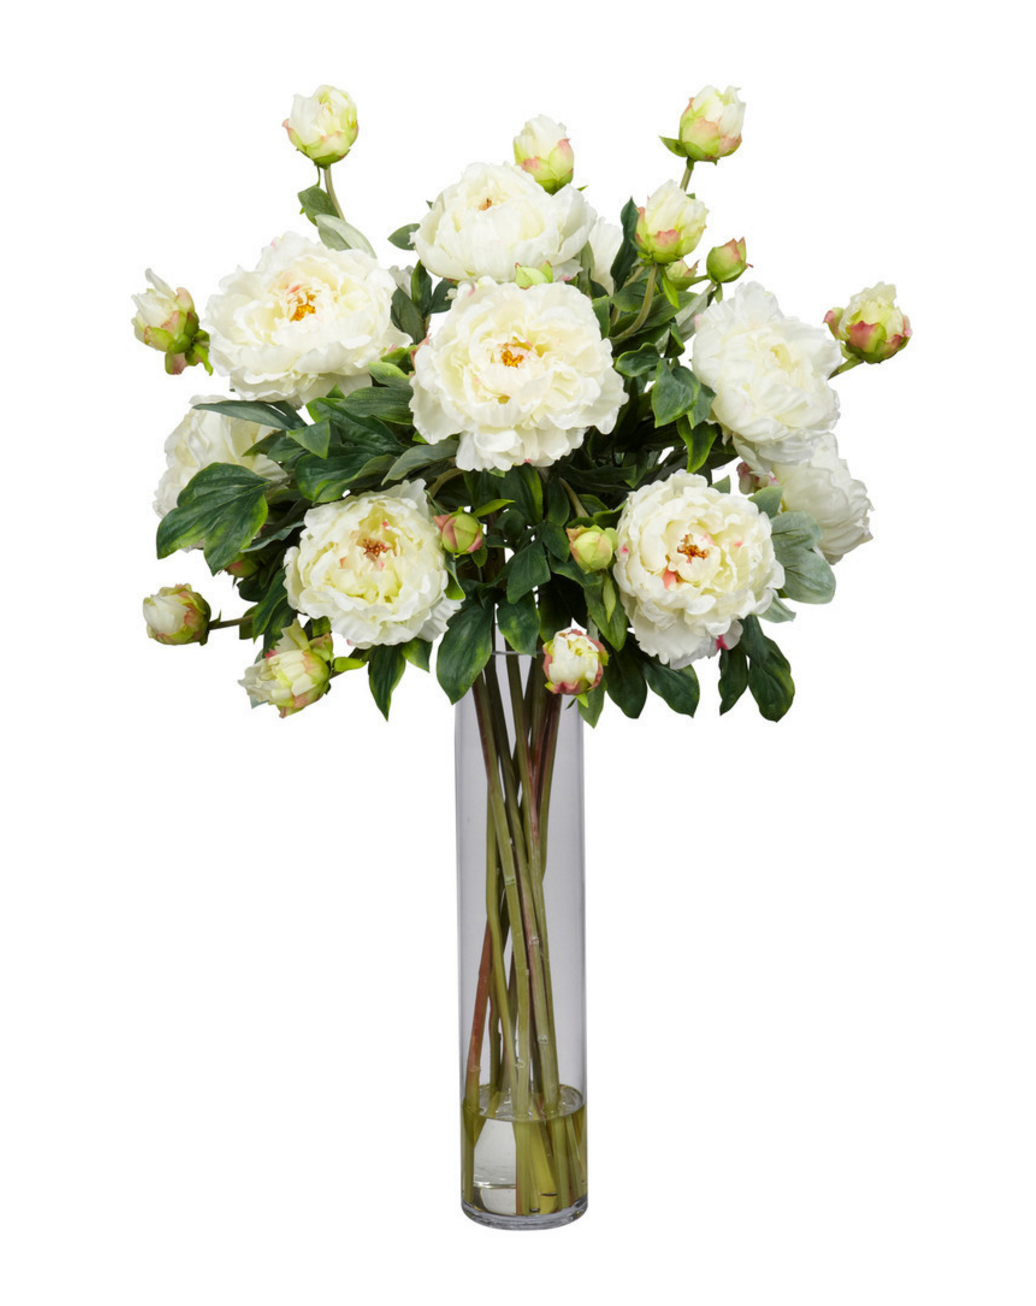 wedding centerpieces fake flowers%0A Silk peony arrangement in a glass vase  Product  Faux floral  arrangementConstruction Material  Silk and glassColor  WhiteDimensions      H x    Diameter